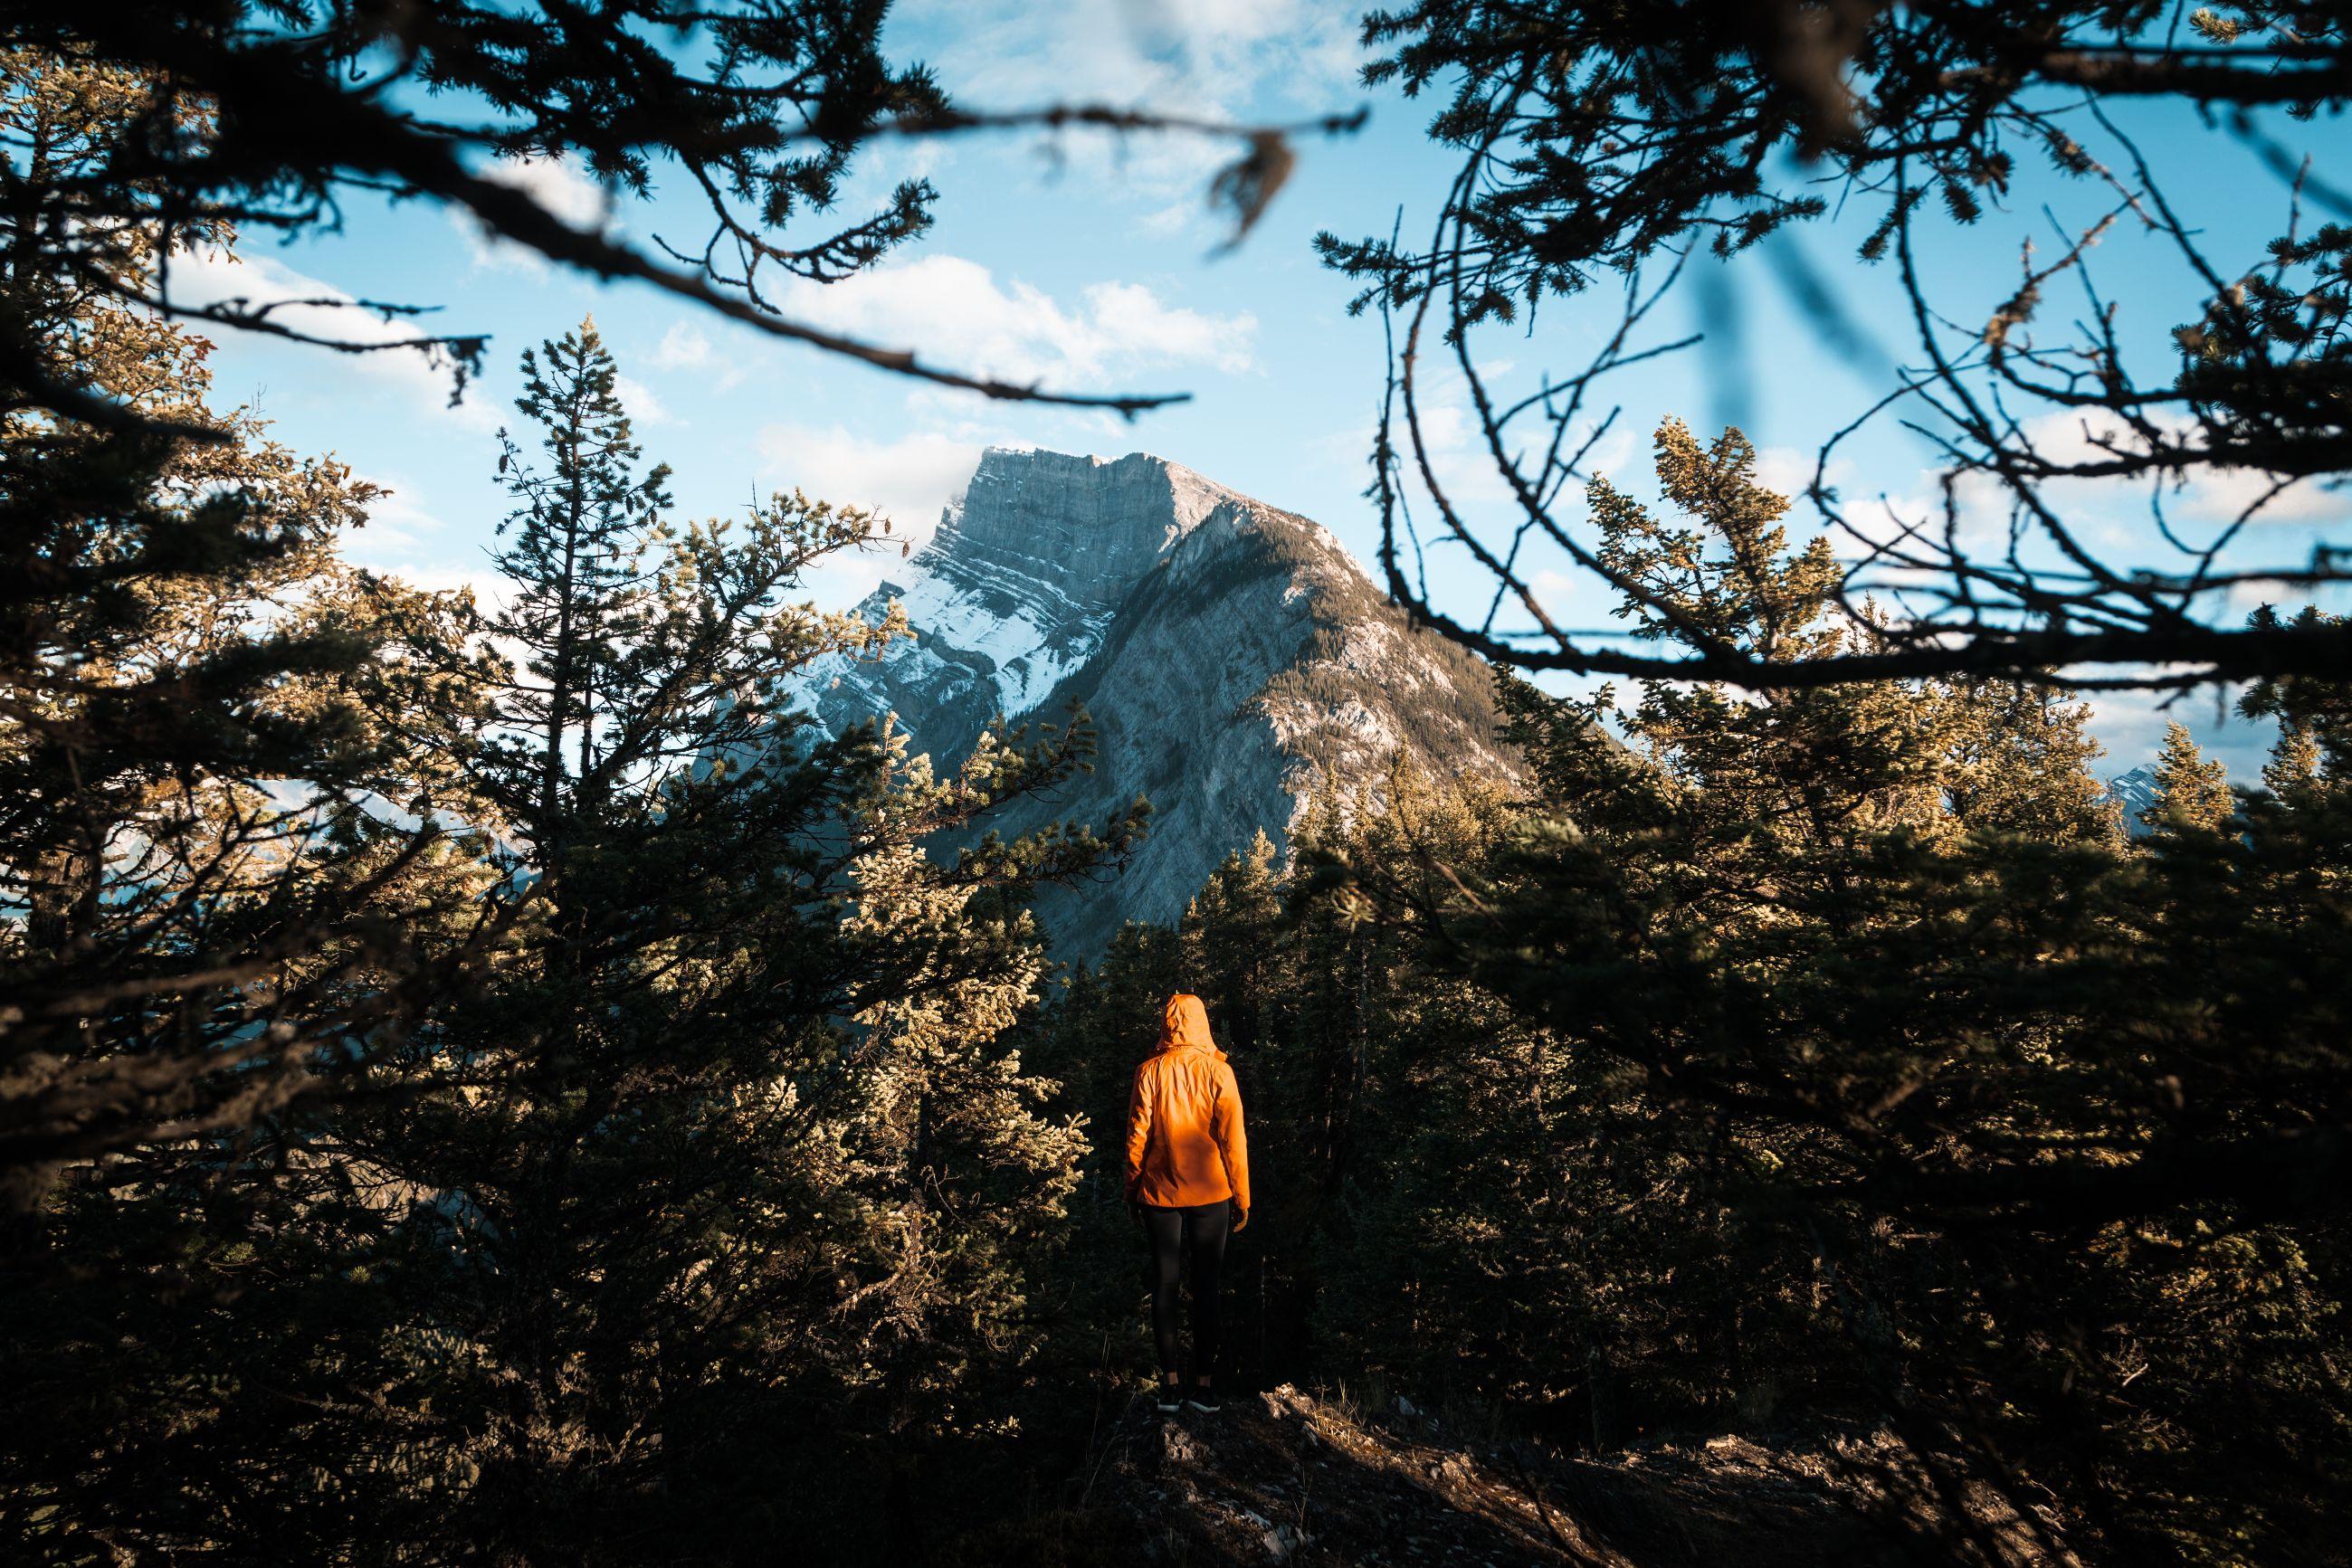 A figure walking through forest towards rocky mountain.